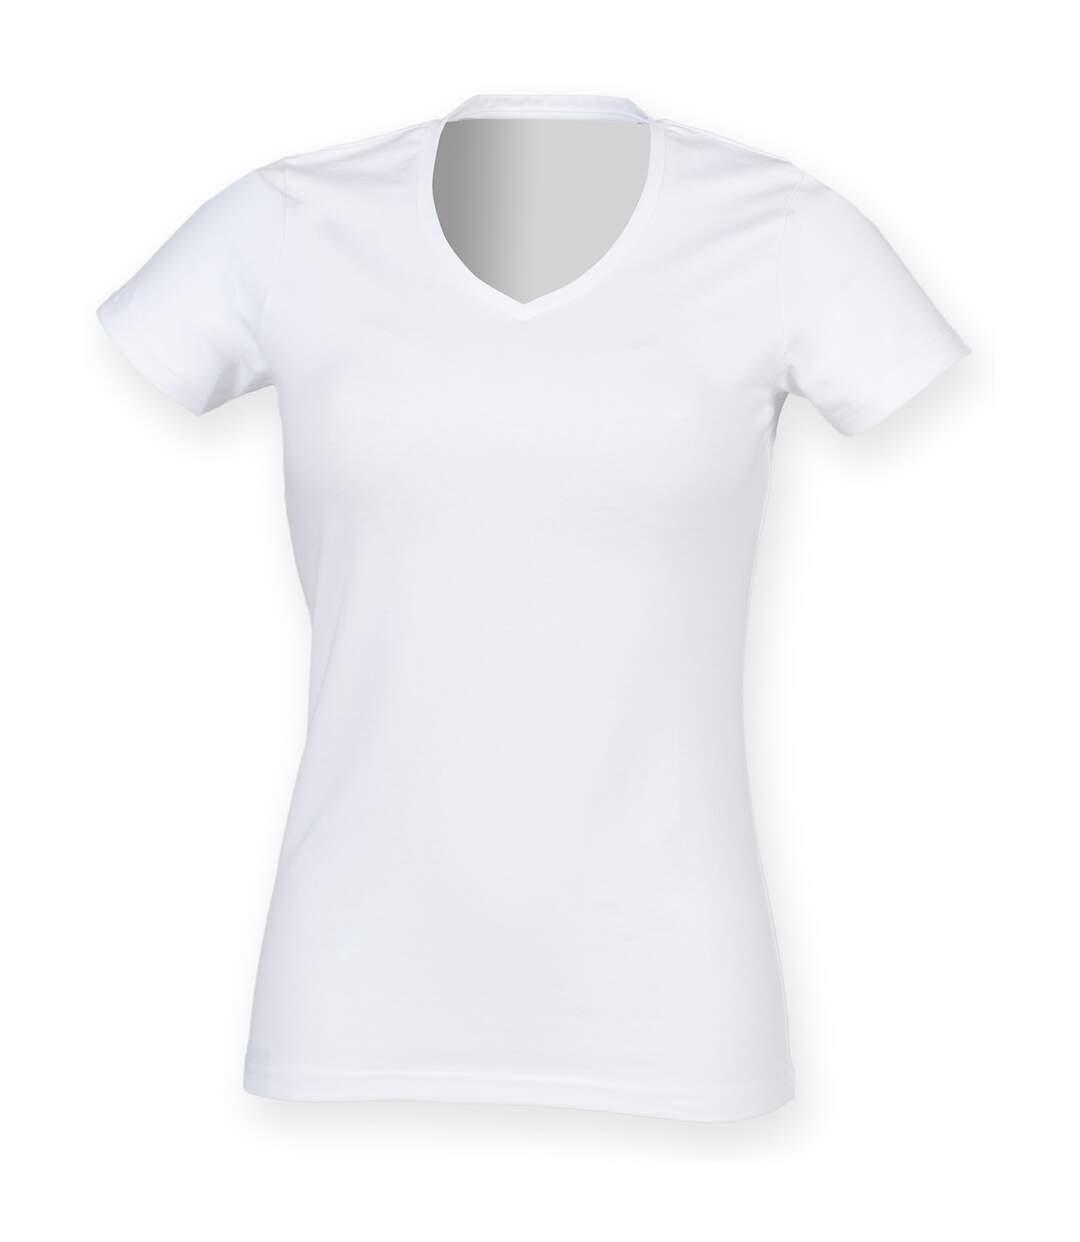 Skinni Fit Feel Good - T-Shirt Étirable À Manches Courtes Et Col En V - Femme (Blanc) - UTRW4423